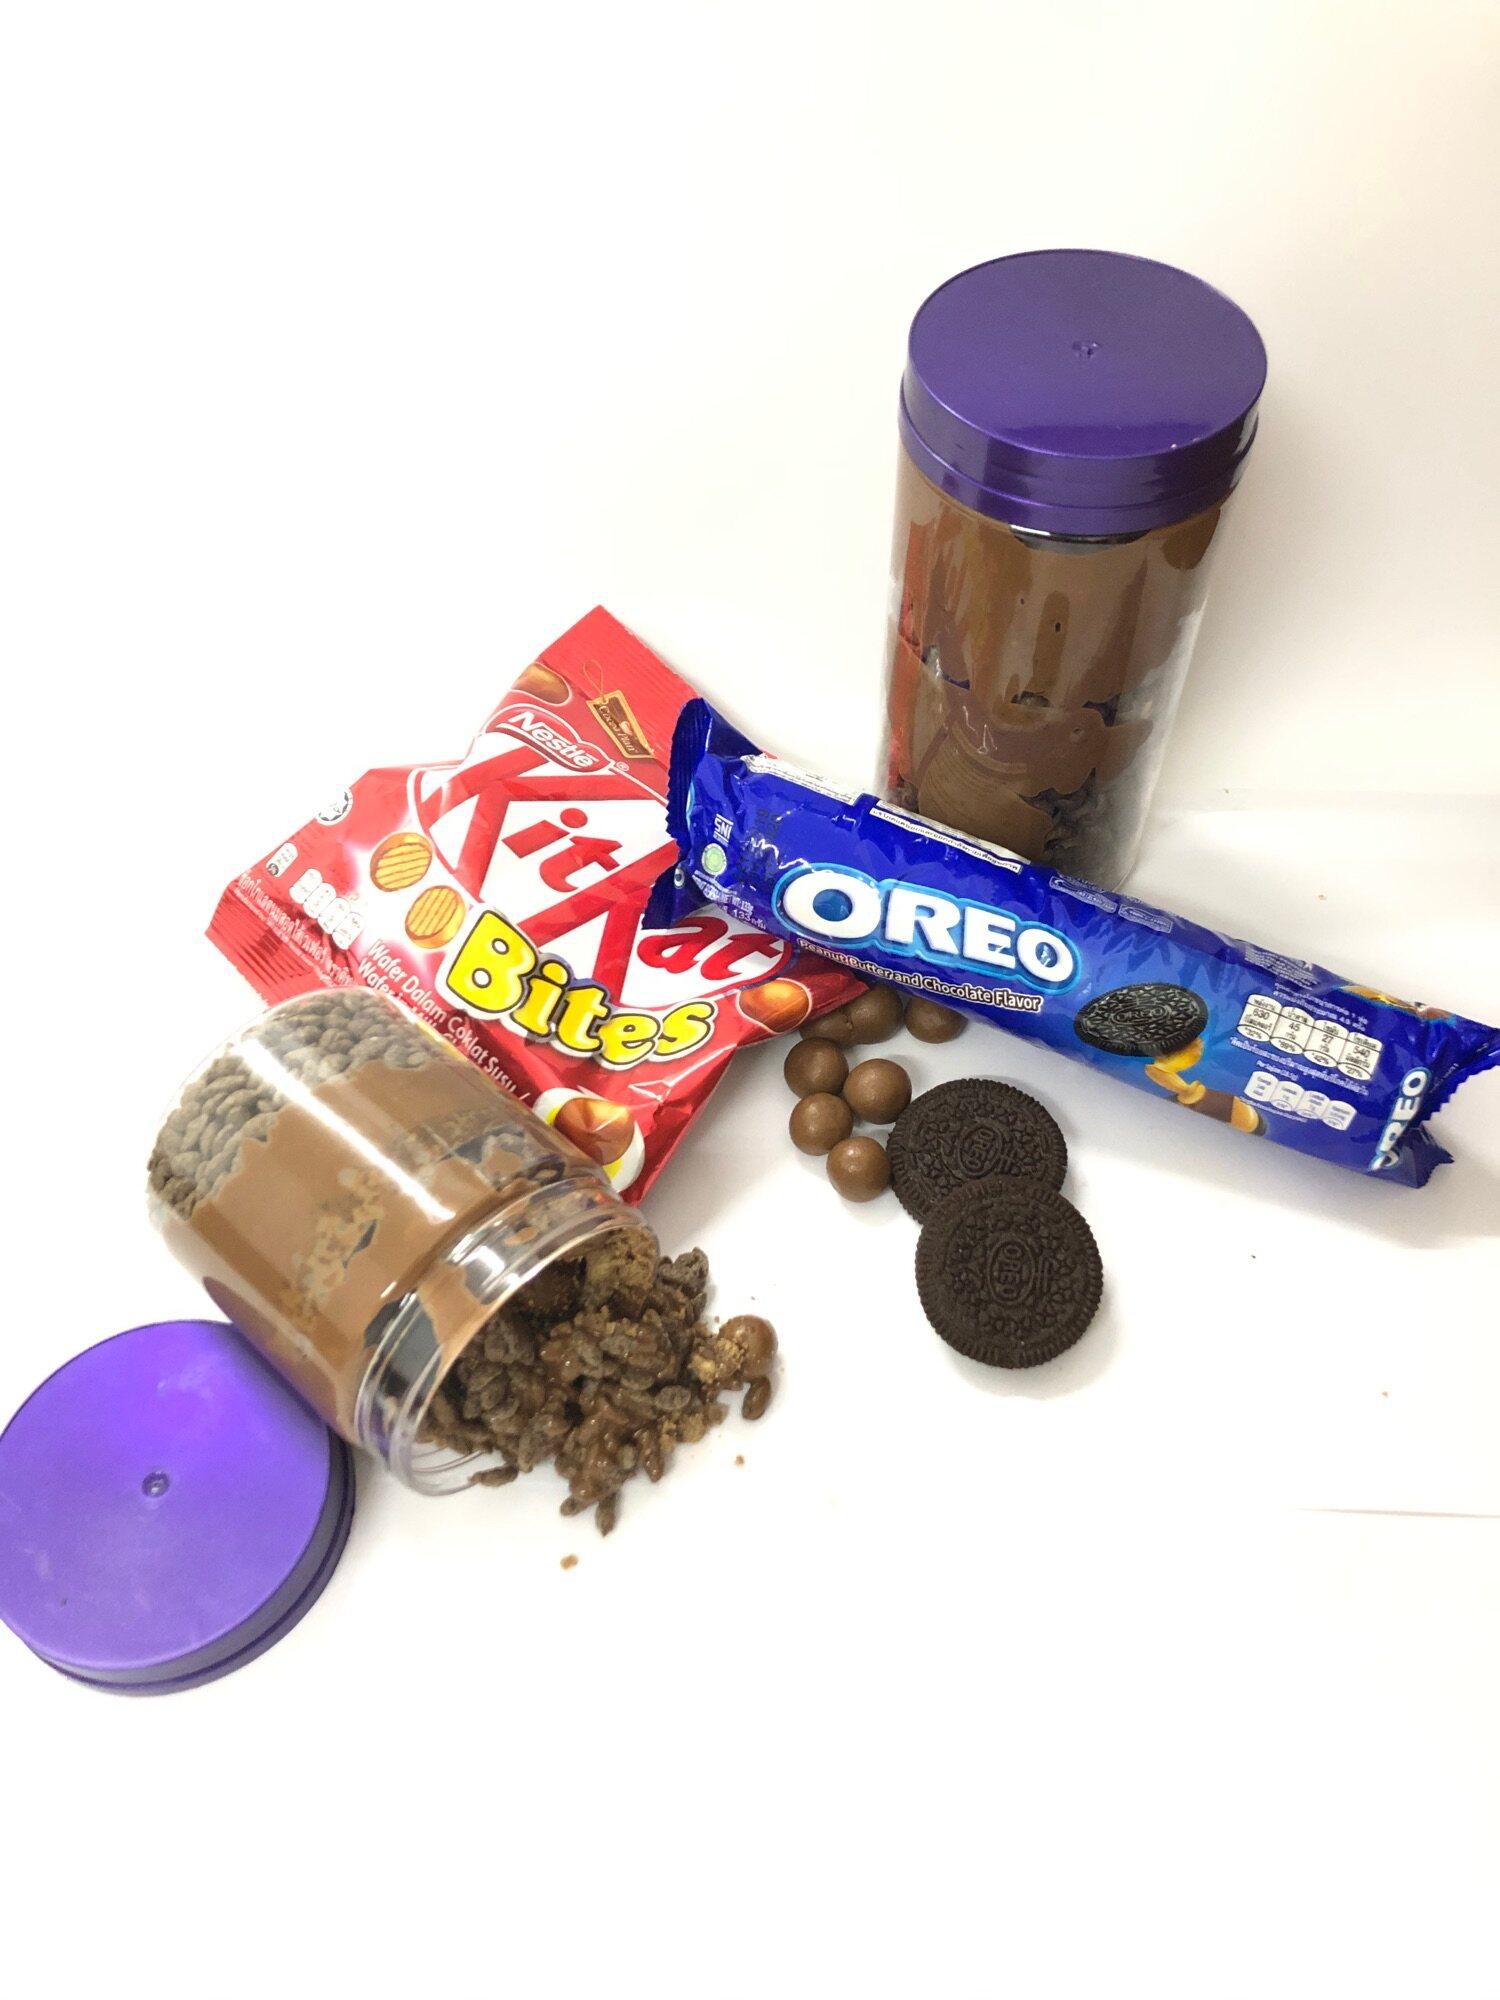 Cadbury Oreo Kit Kat Nutella Milo Coco Mix Nut Cadbury Choco Jar Marshmallow Cadbury Choco Jar